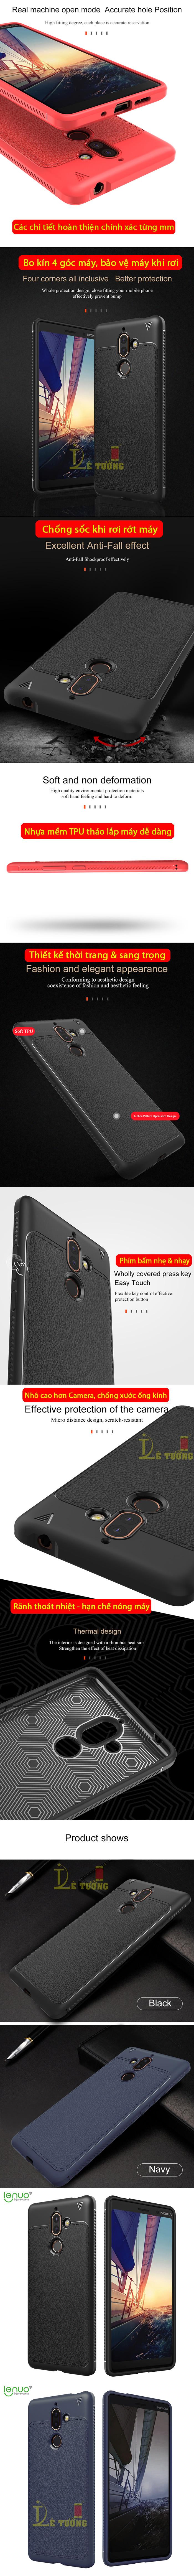 Ốp lưng Nokia 7 Plus Lenuo Leshen Serie vân da sang trọng 4